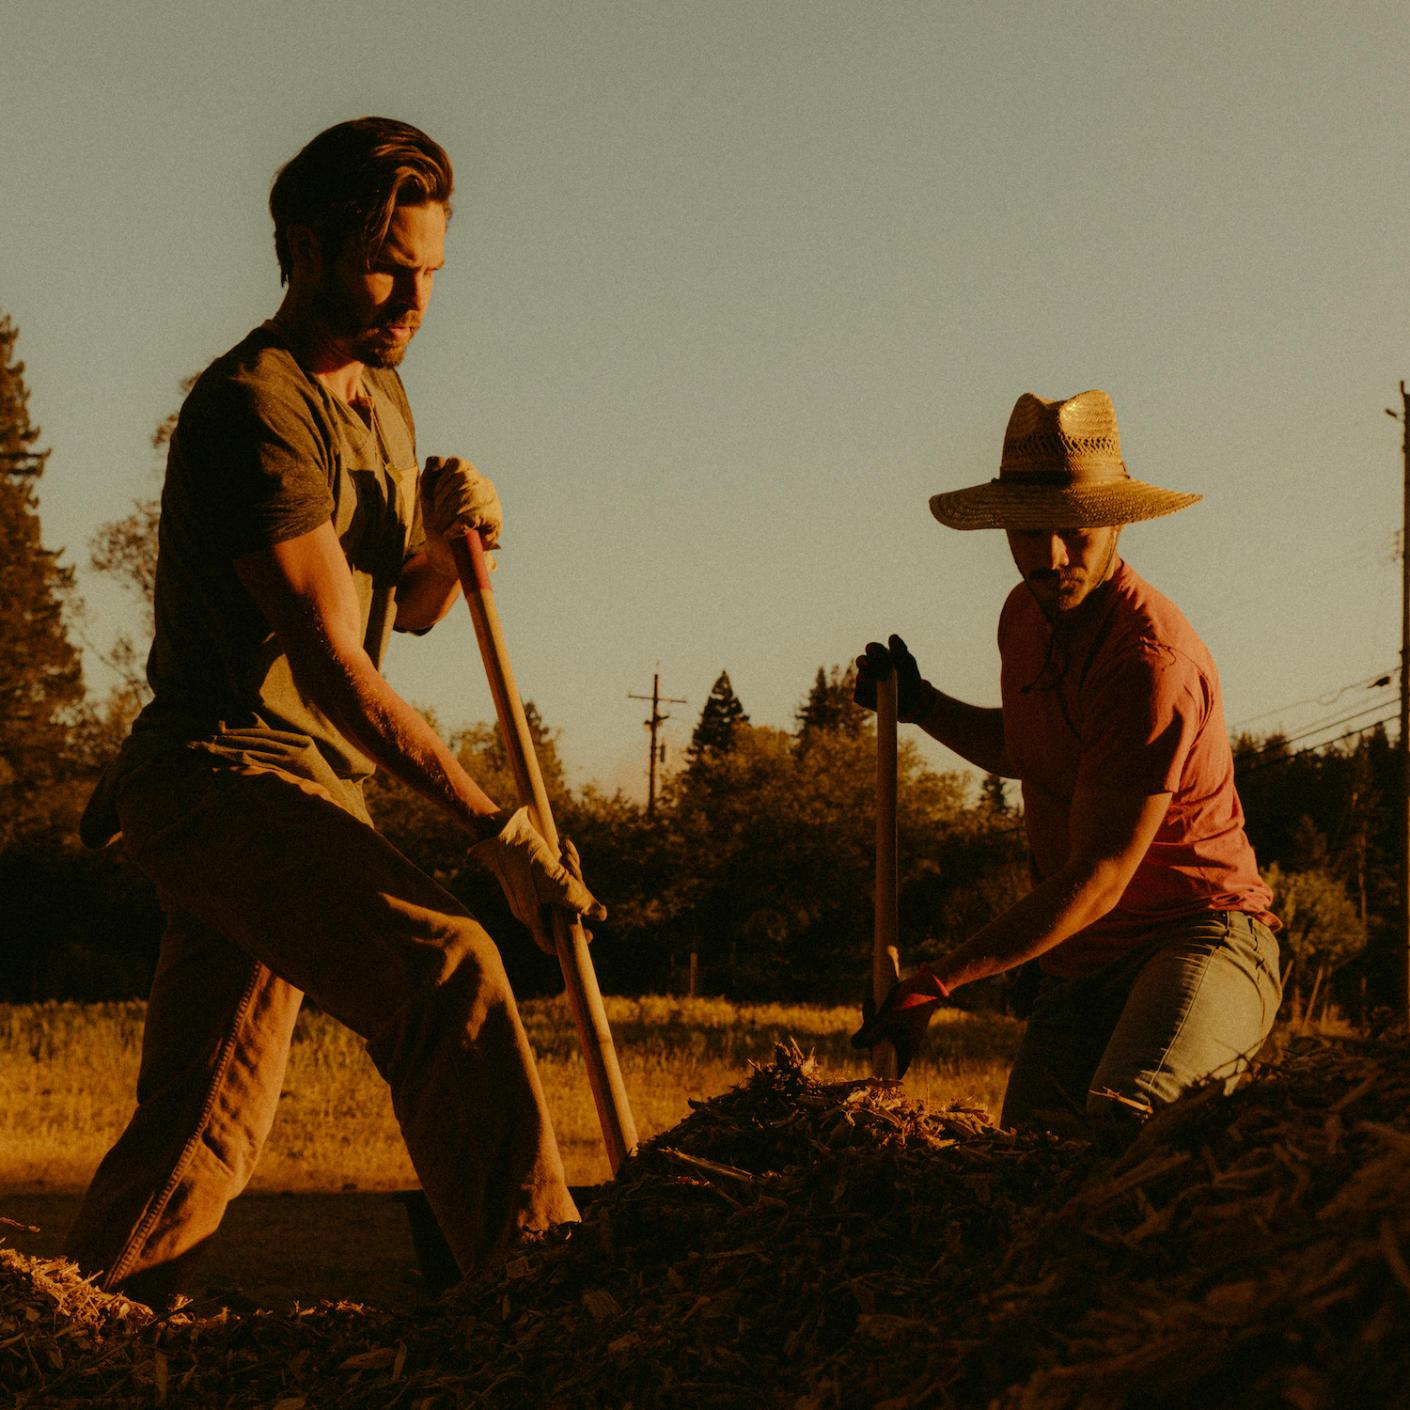 Two farmers in San Francisco